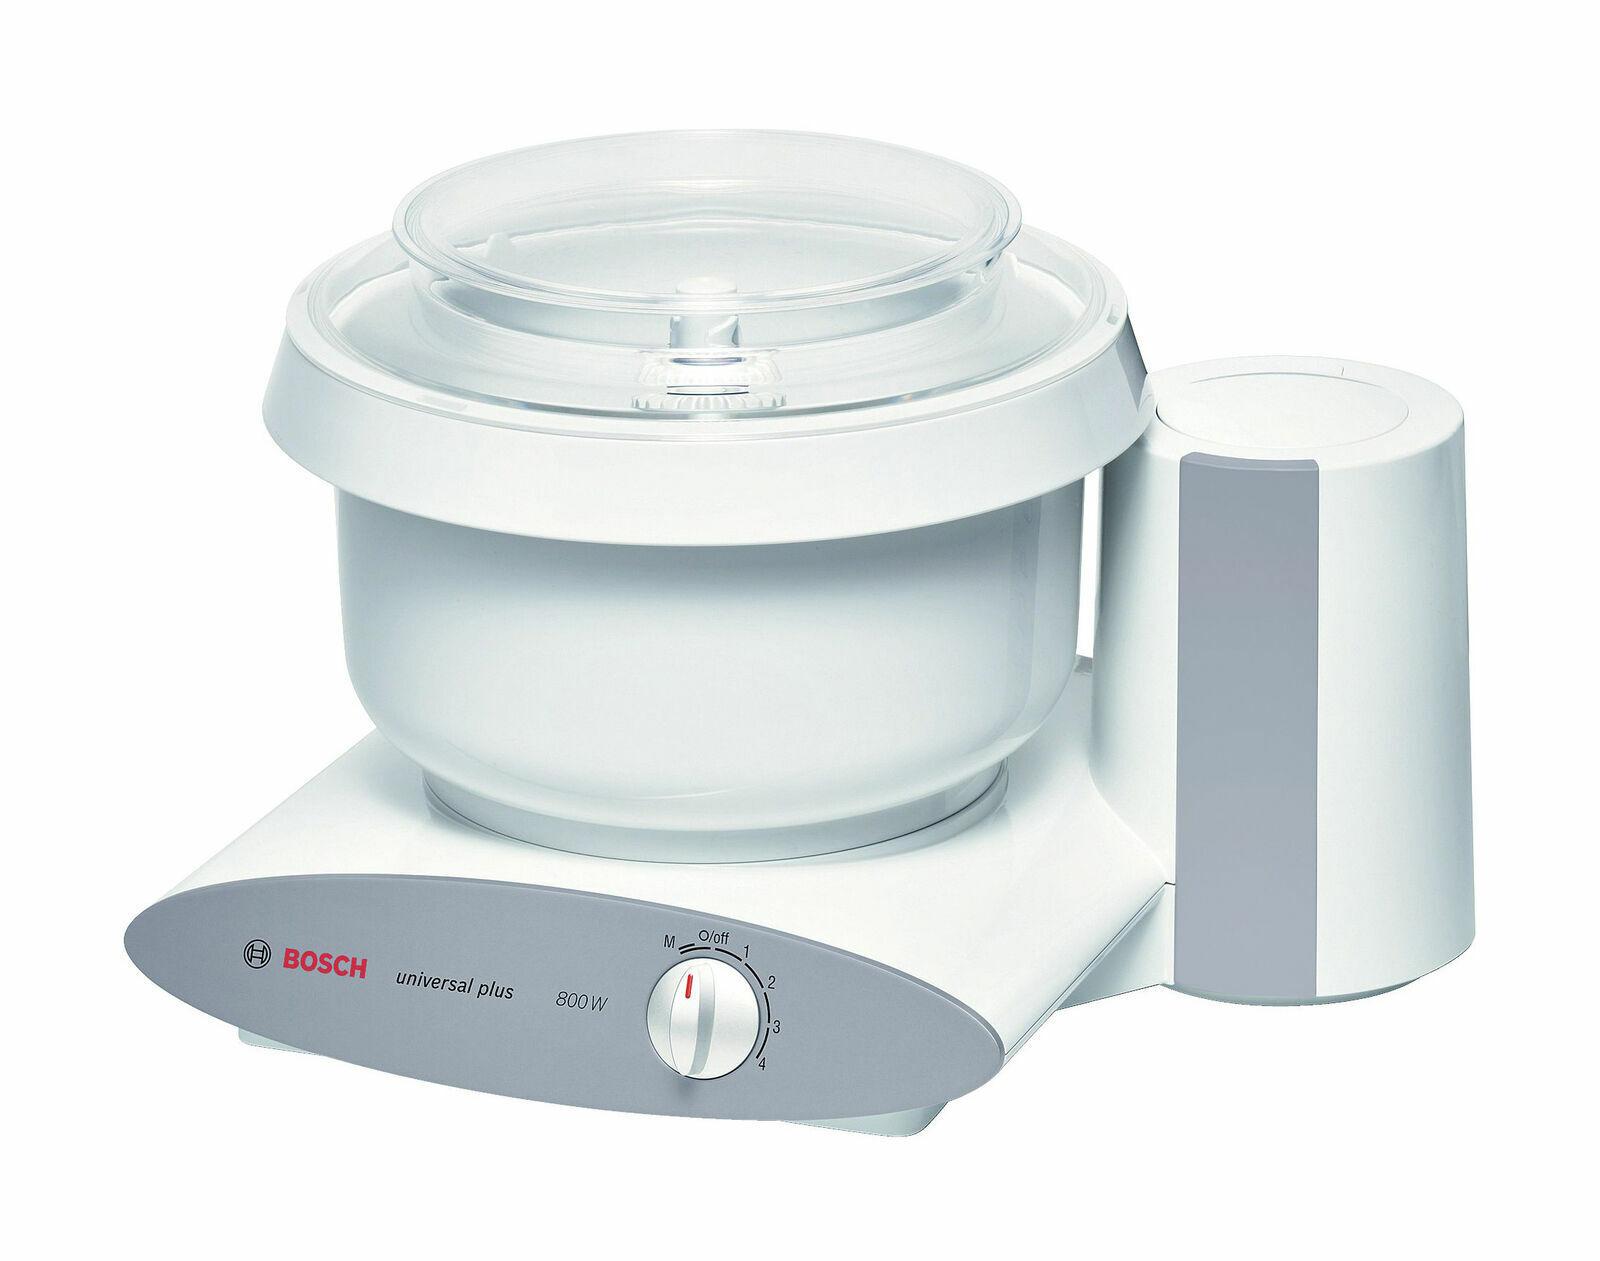 Bosch MUM6N10UCDE Universal Plus 800W Stand Mixer - White